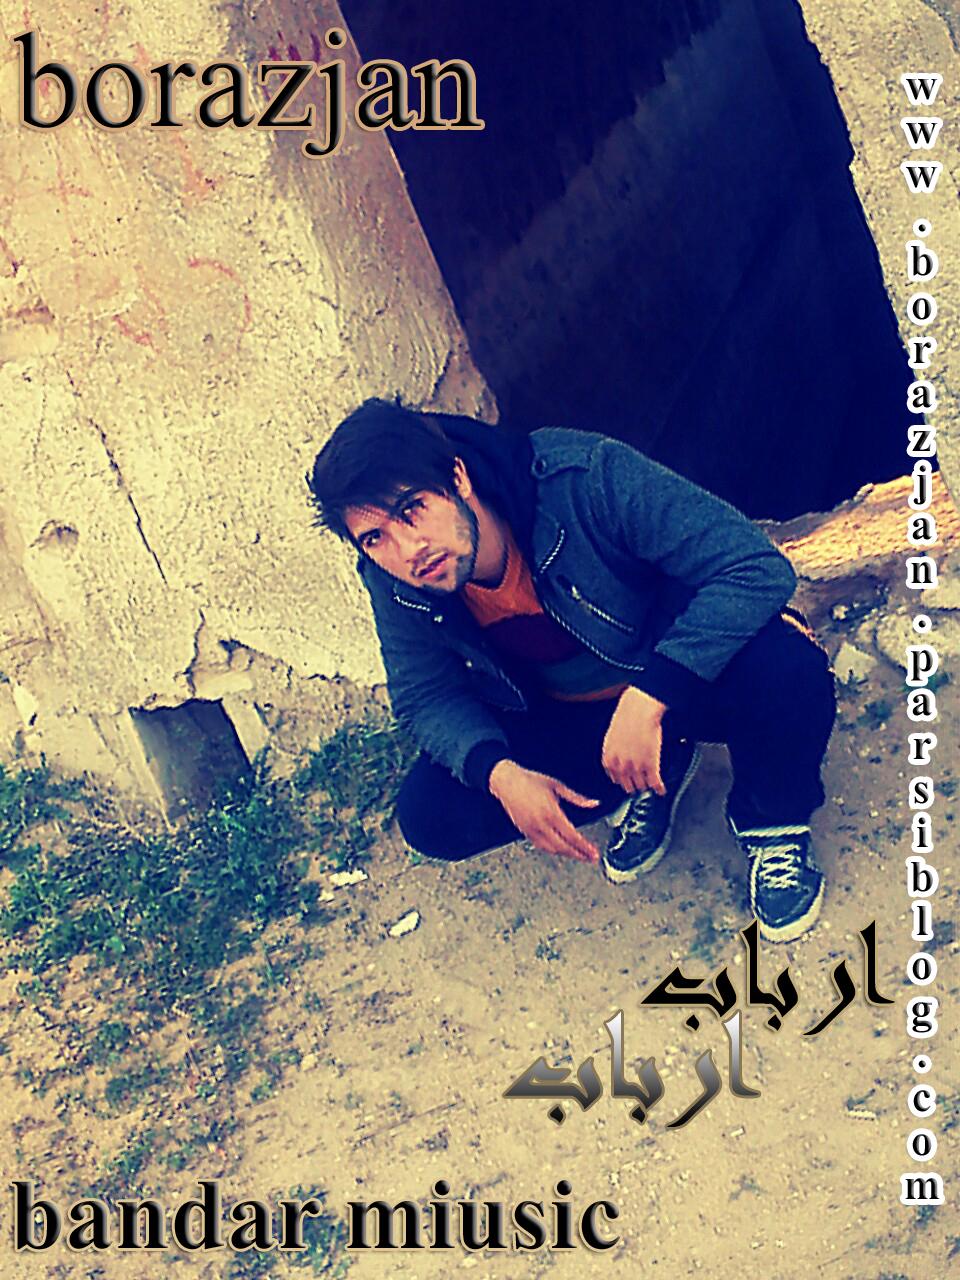 http://mohammad1368shah.persiangig.com/arbab/IMG______________________________%20copy.jpg